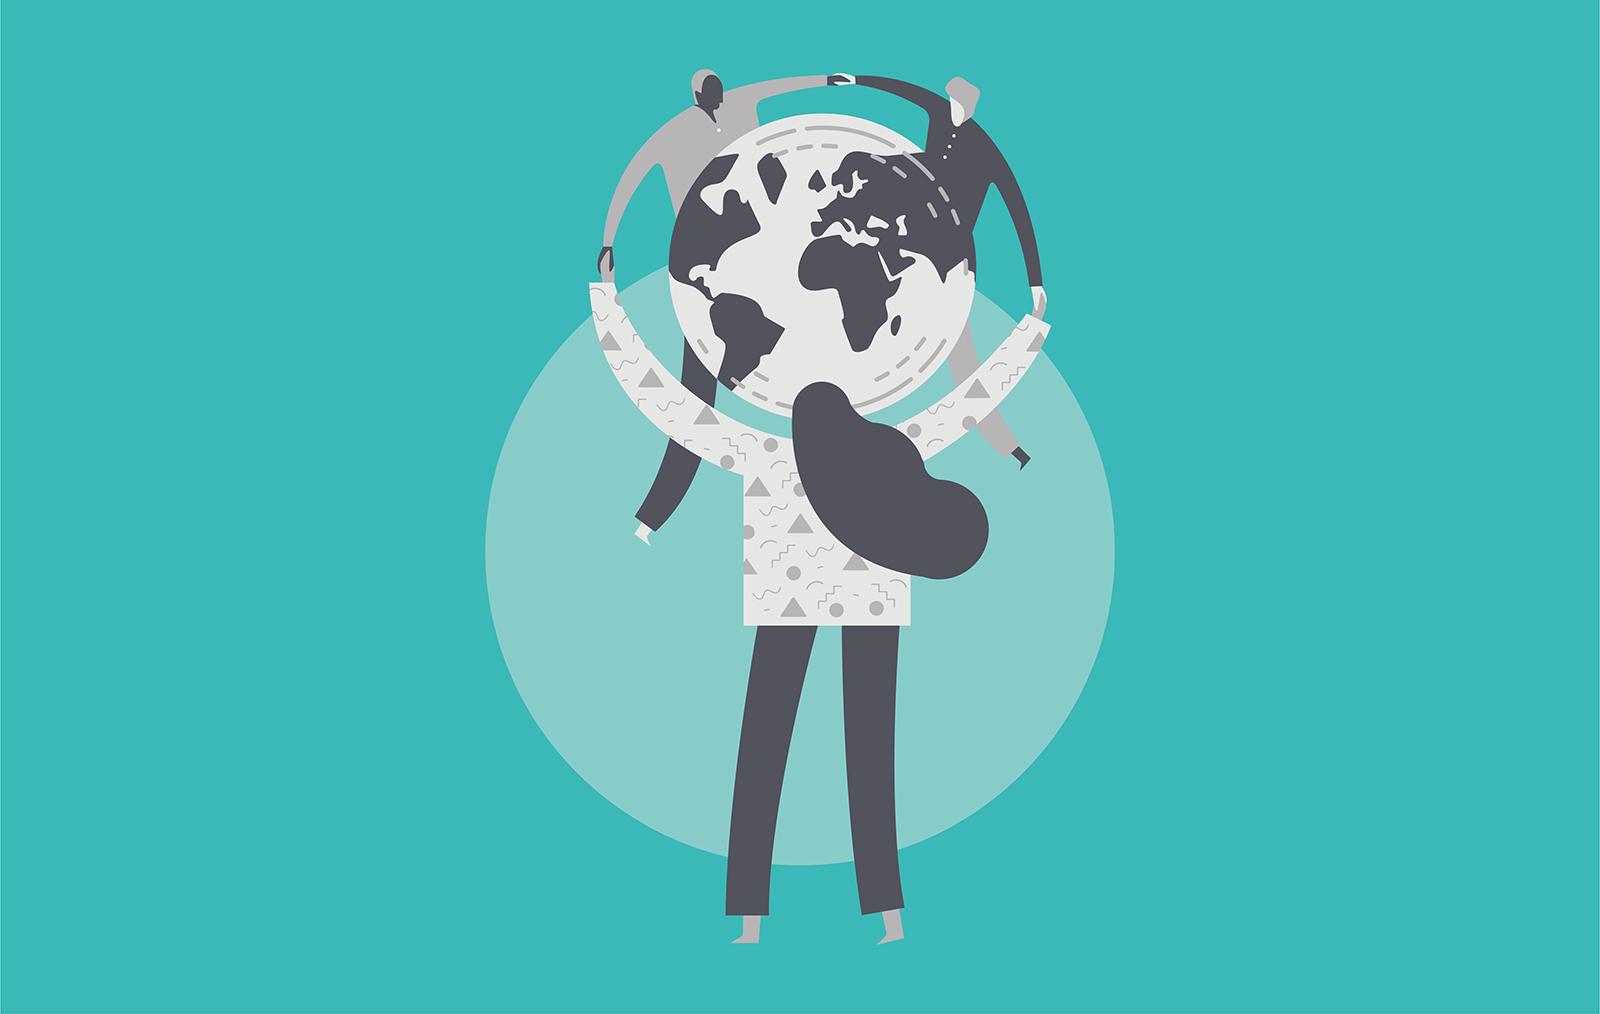 Illustration of global cooperation